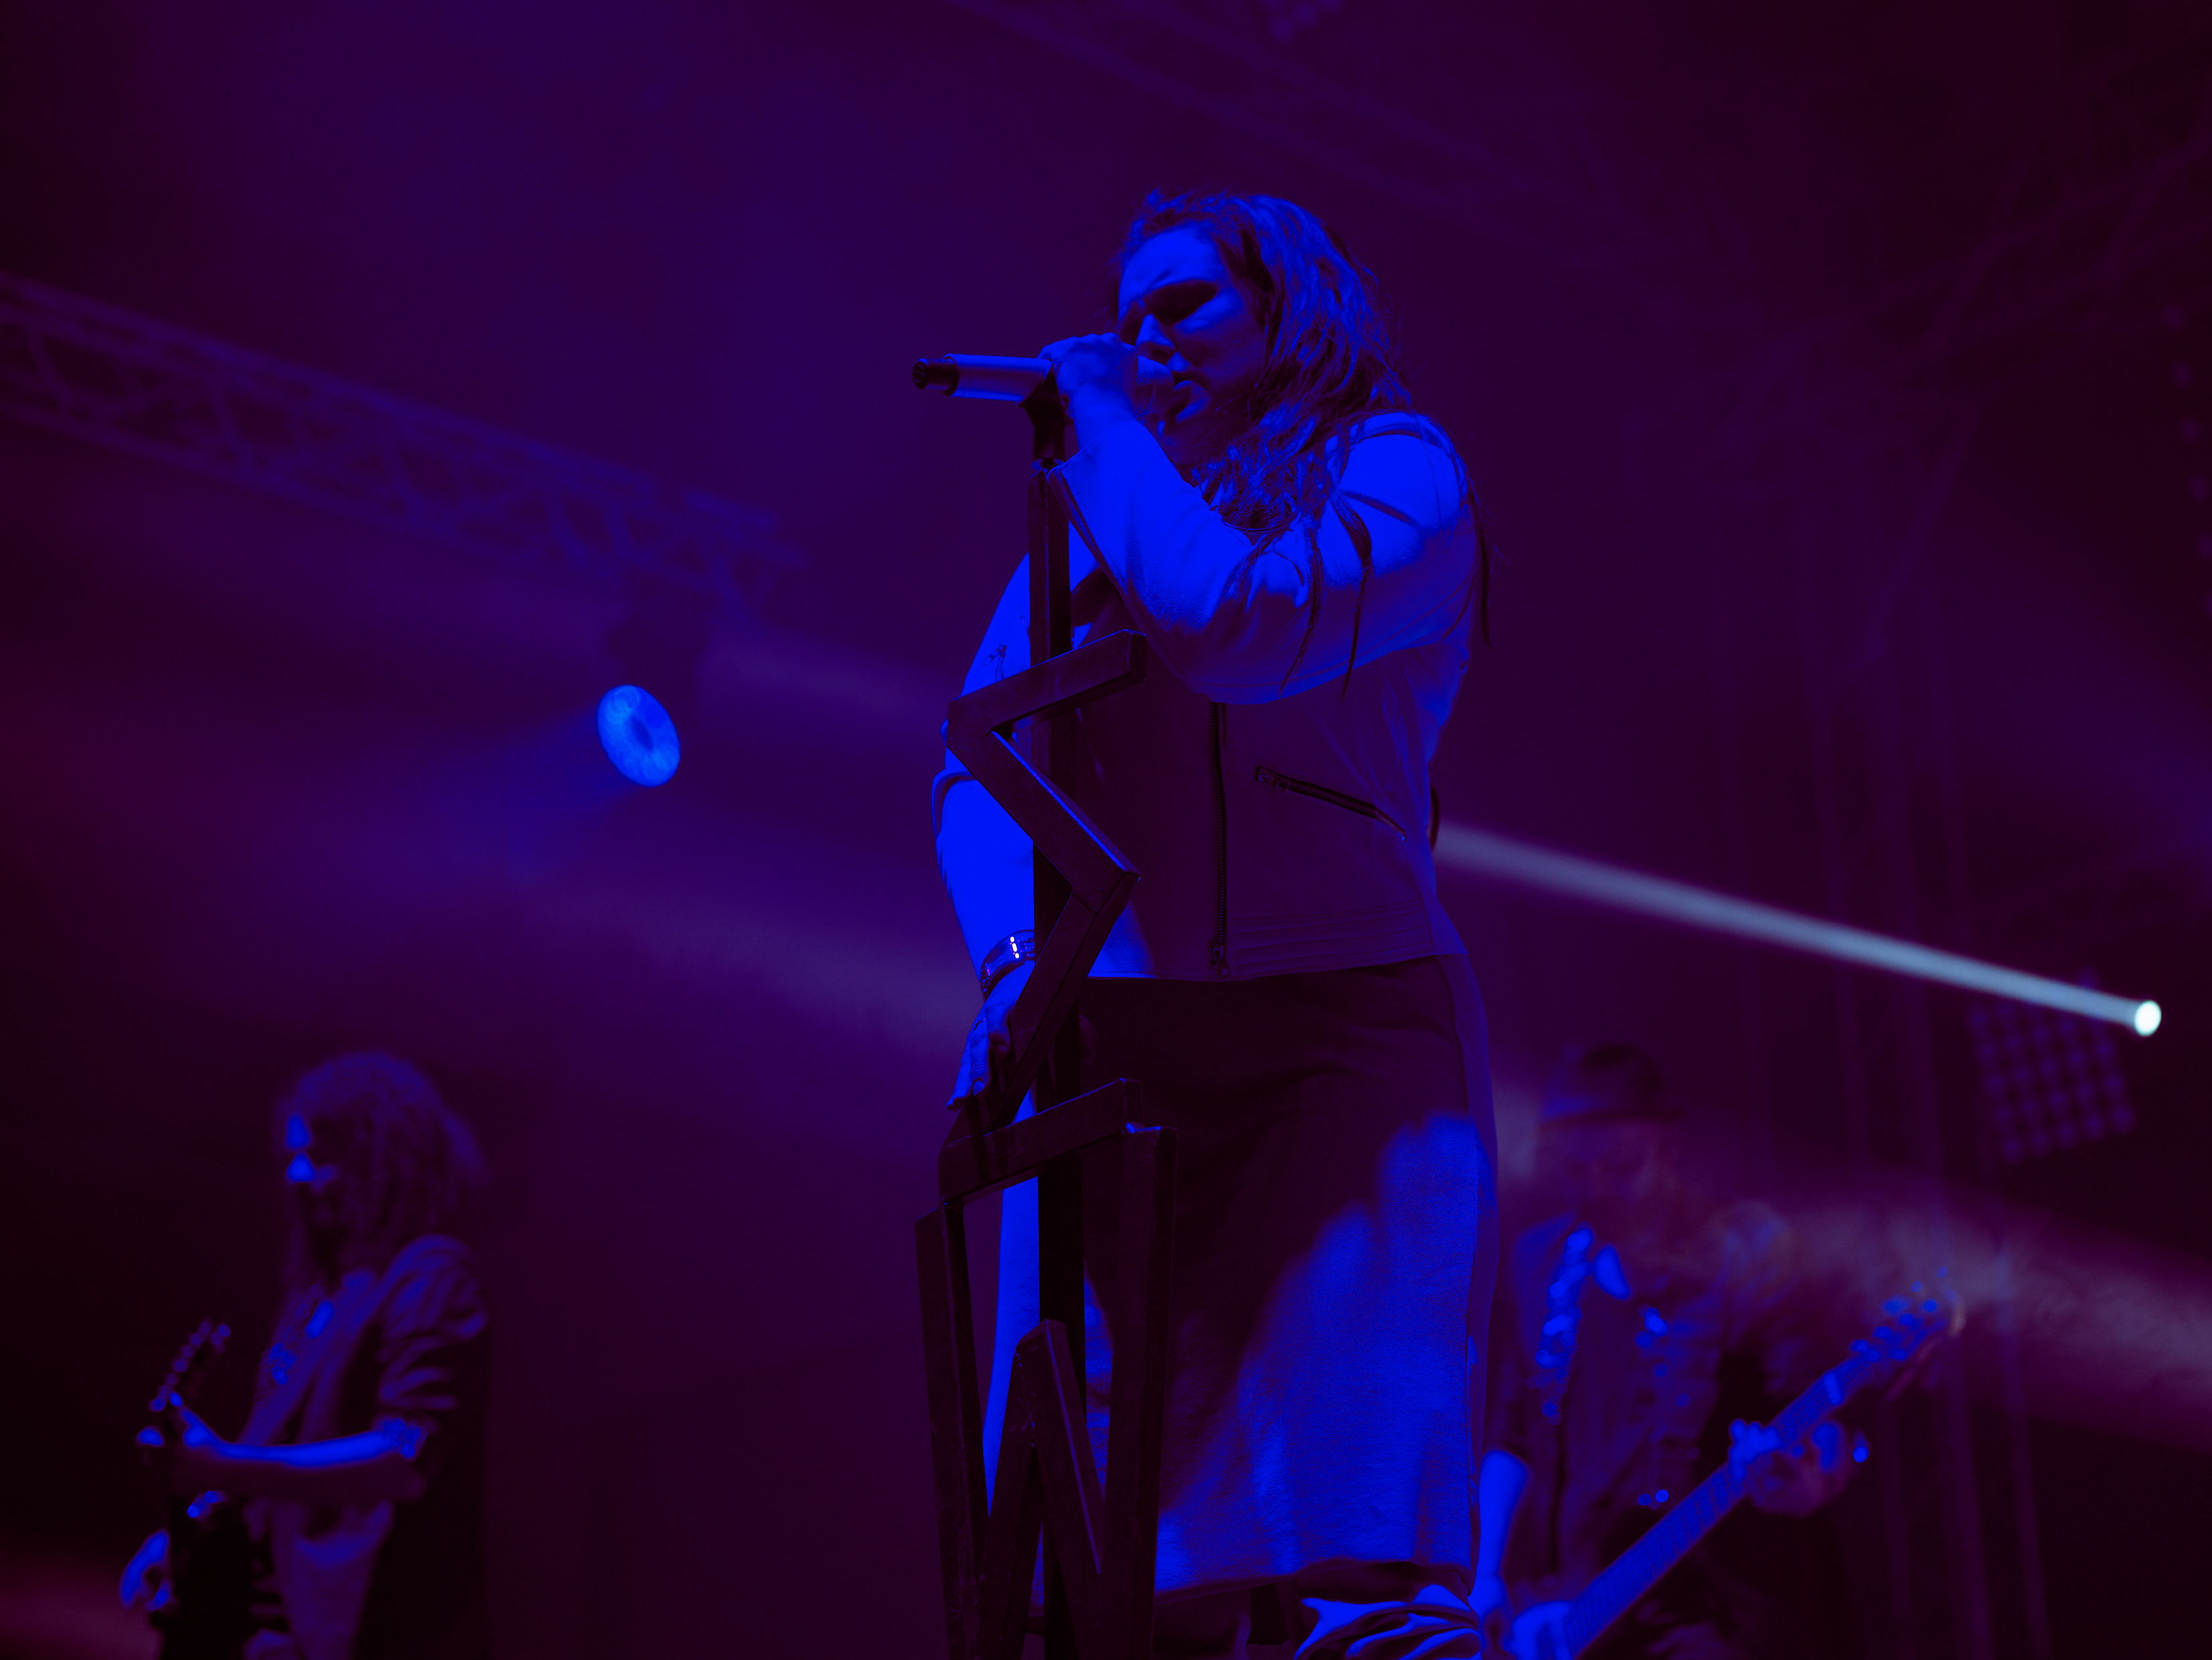 koncert Ewa Farna